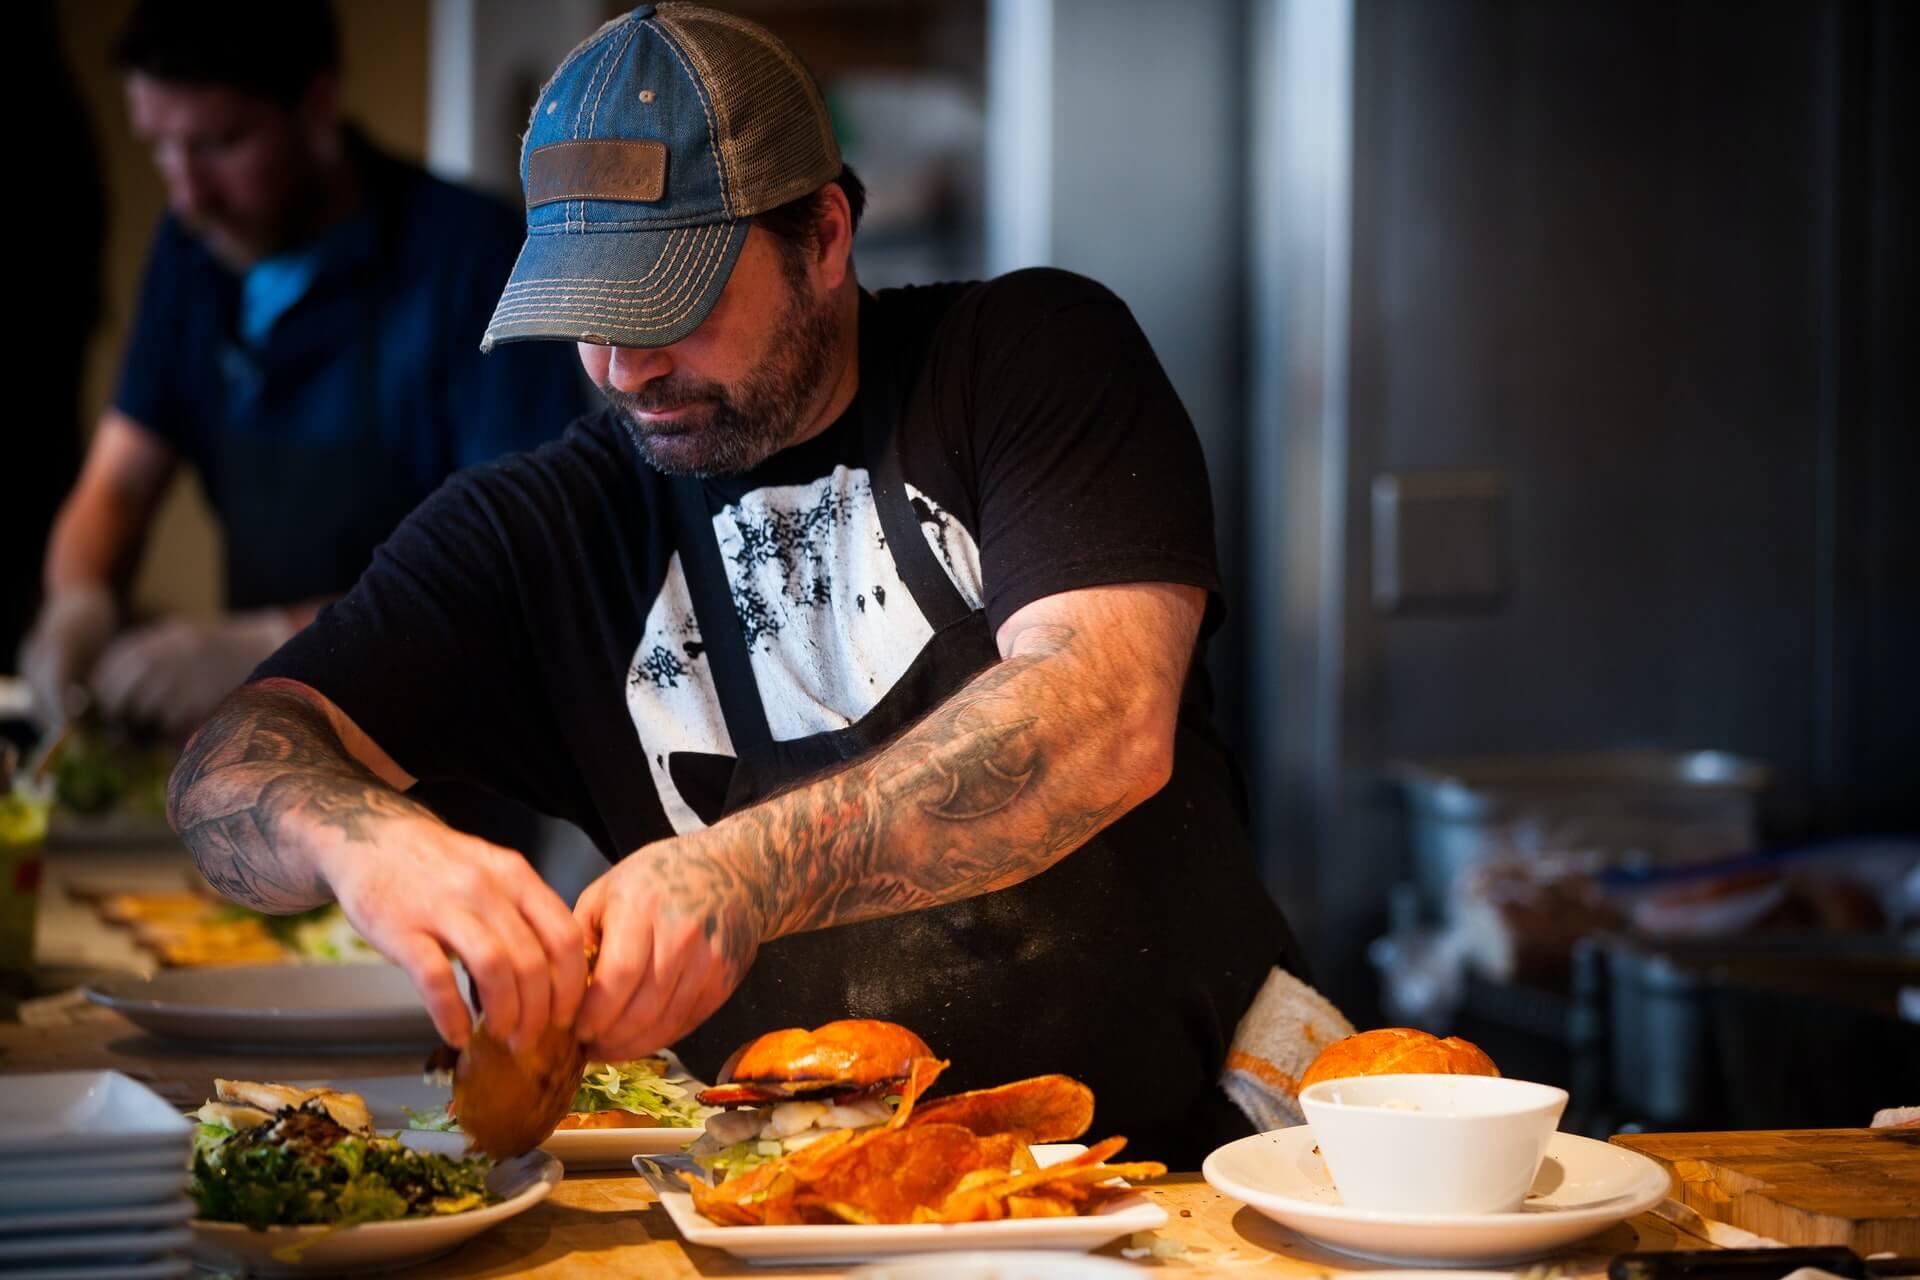 Chef preparing burgers inside restaurant